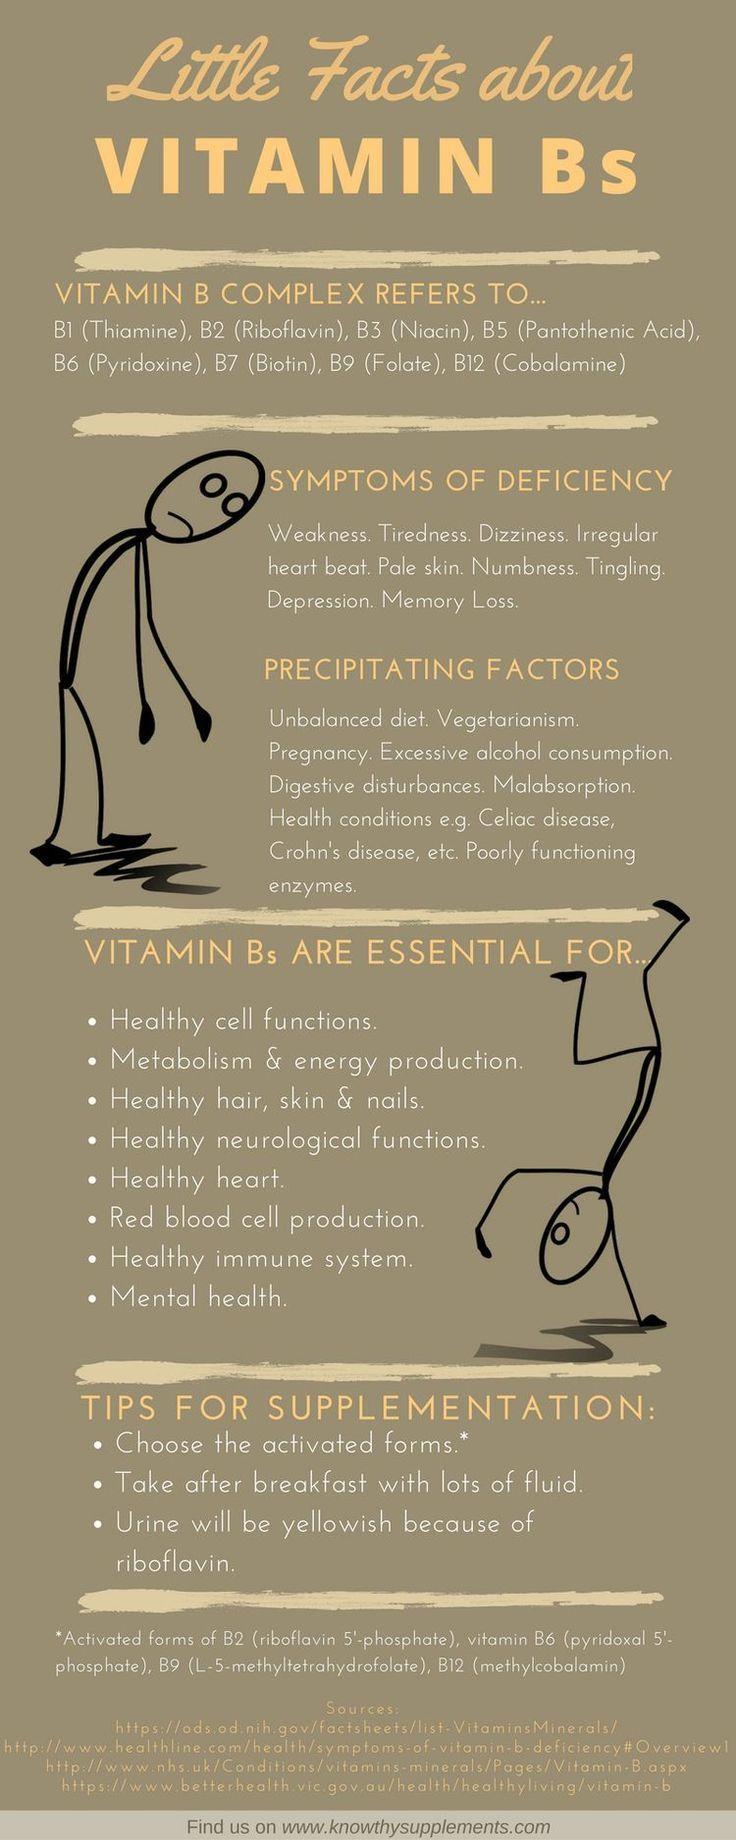 Vitamin B complex [B1 (Thiamine), B2 (Riboflavin), B3 (Niacin), B5 (Pantothenic Acid), B6 (Pyridoxine), B7 (Biotin), B9 (Folate) and B12 (Cobalamine).]: symptoms of deficiency, reasons, benefits (energy, skin) and tips on taking vit b supplement #animals #vitaminD #animals #vitaminB